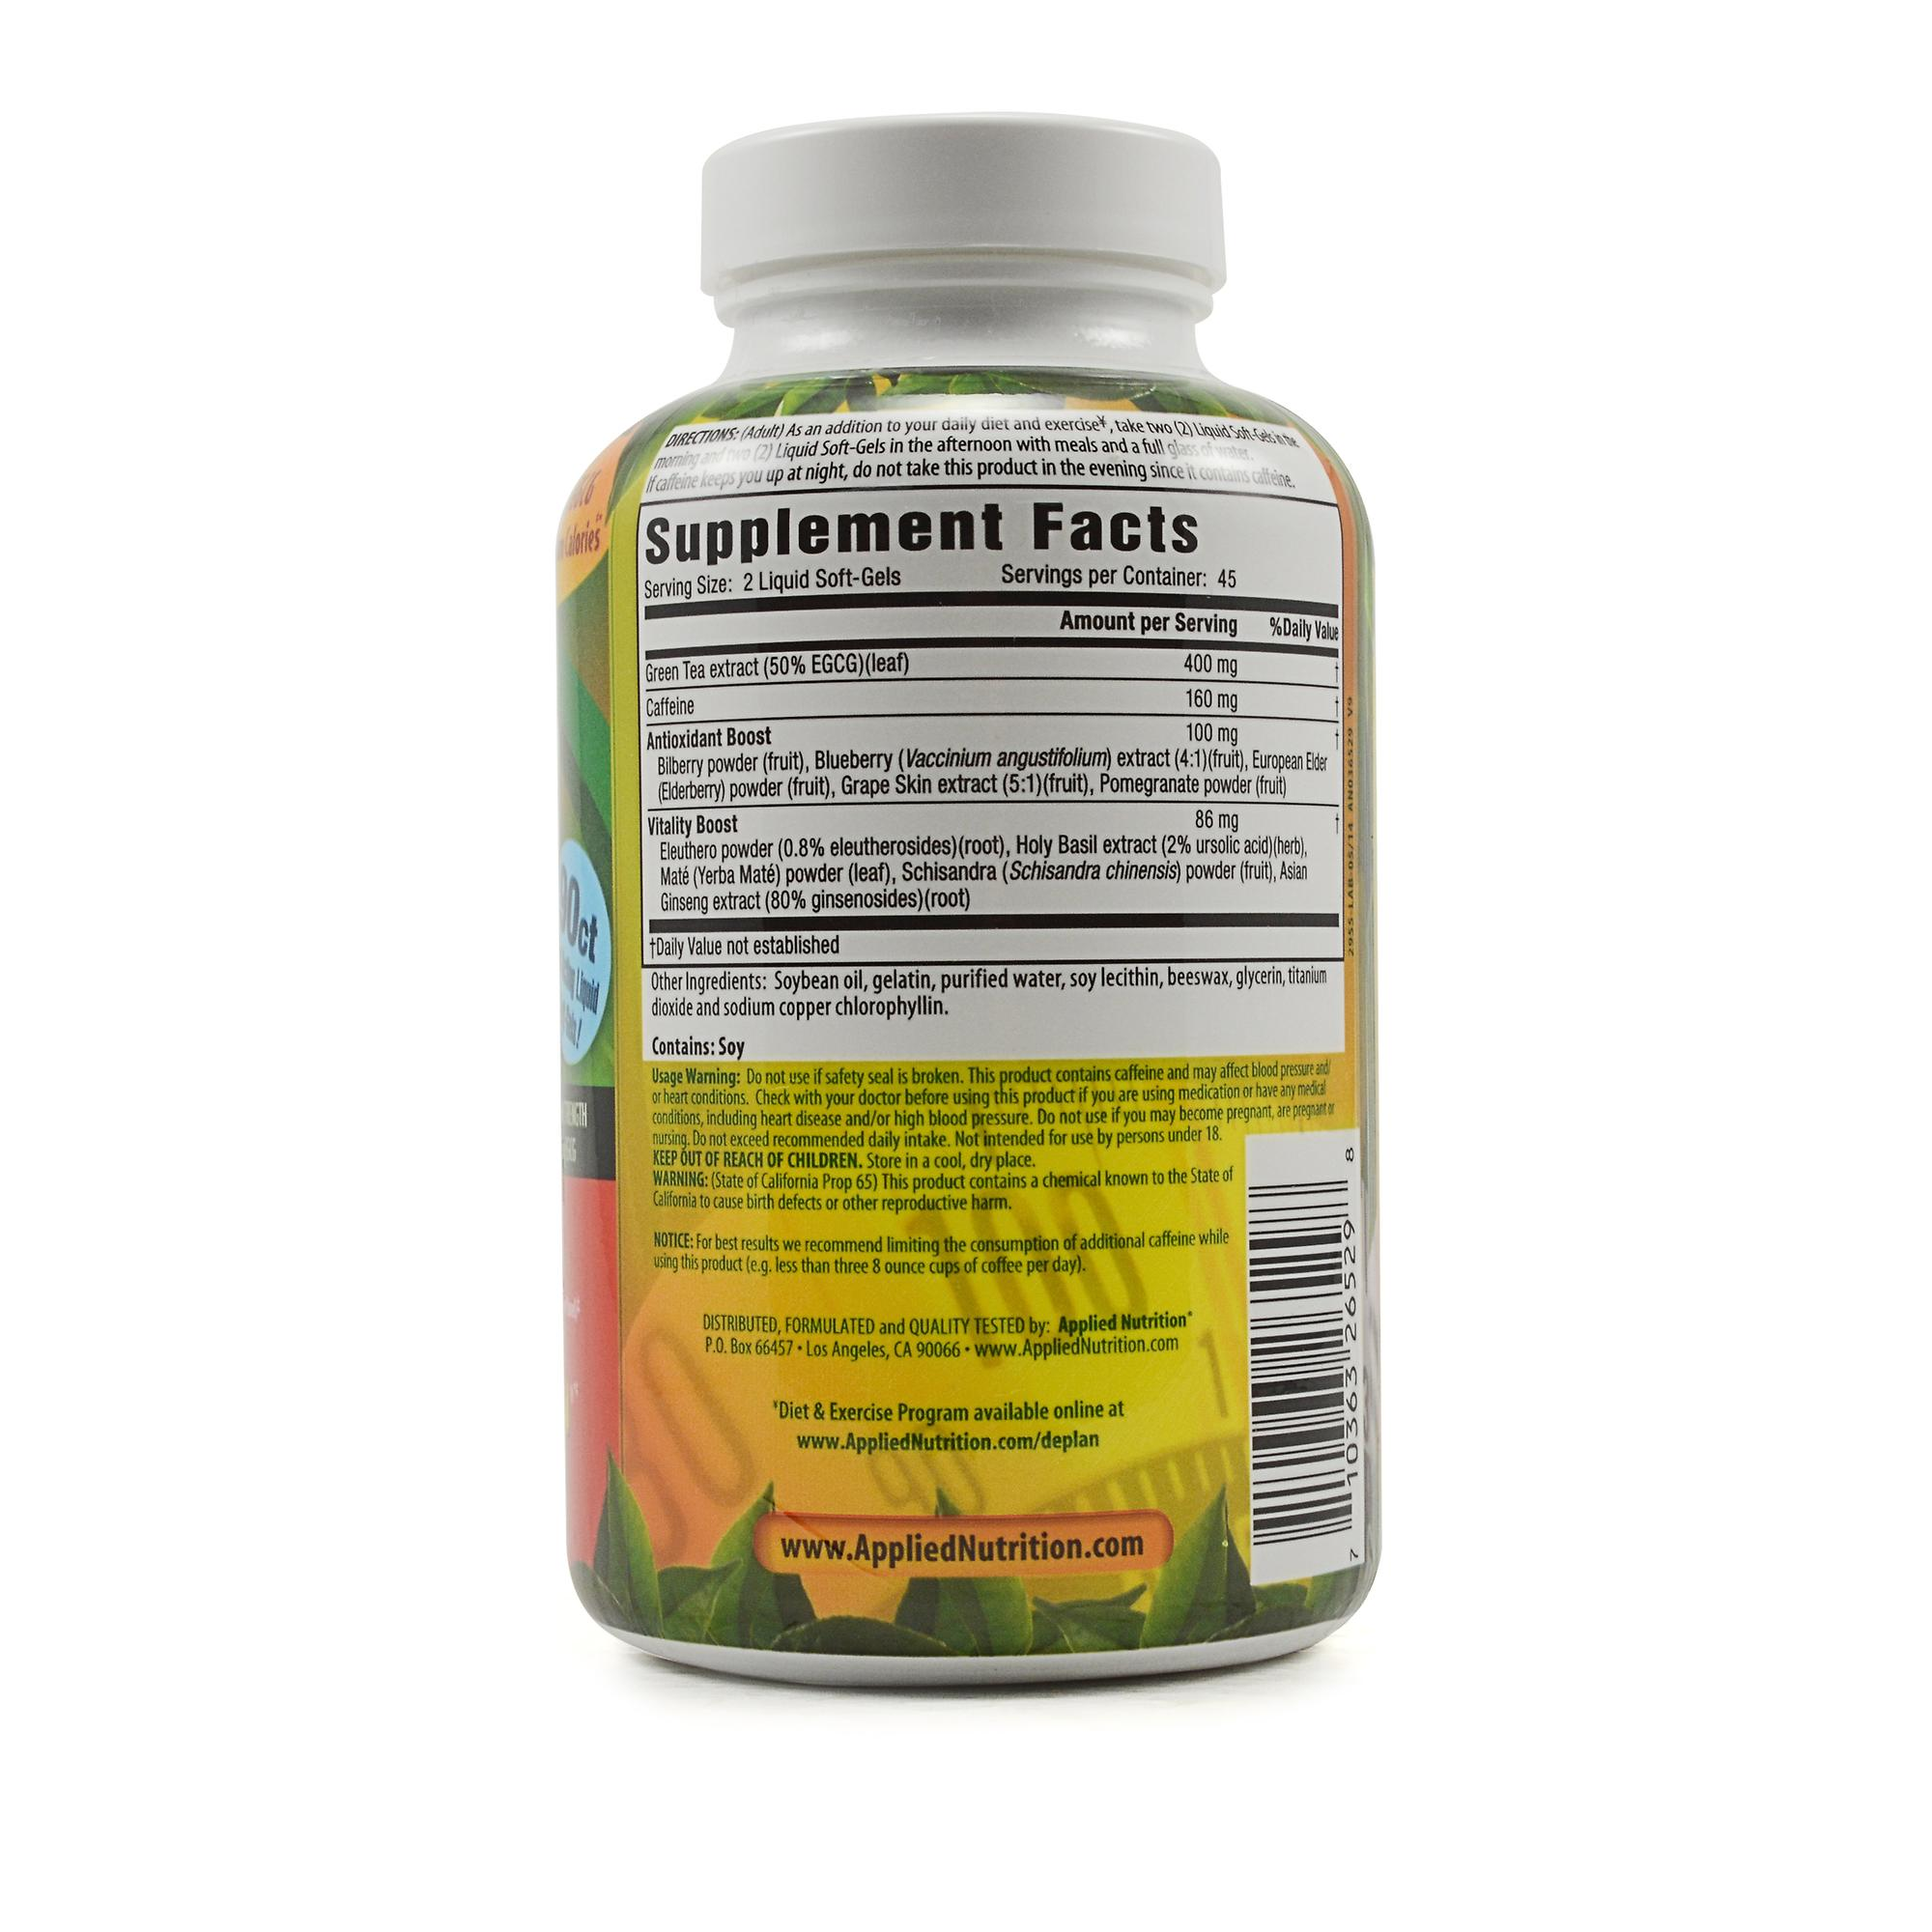 Nutribullet weight loss powder uk image 26